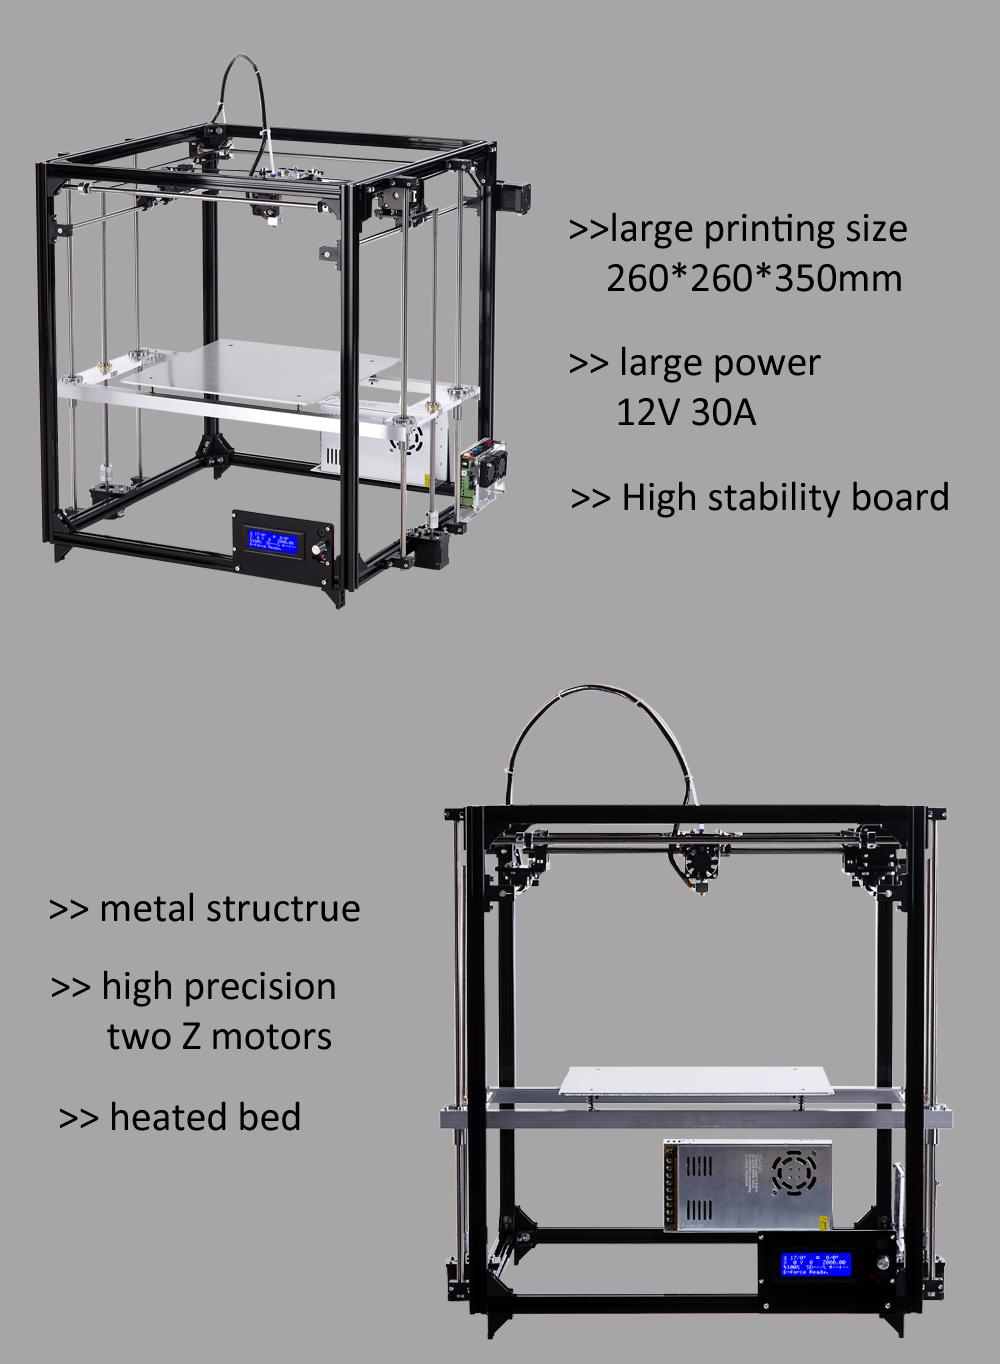 ⊱Flsun Cube 3d Printer ᐊ Metal Metal Frame Large Printing